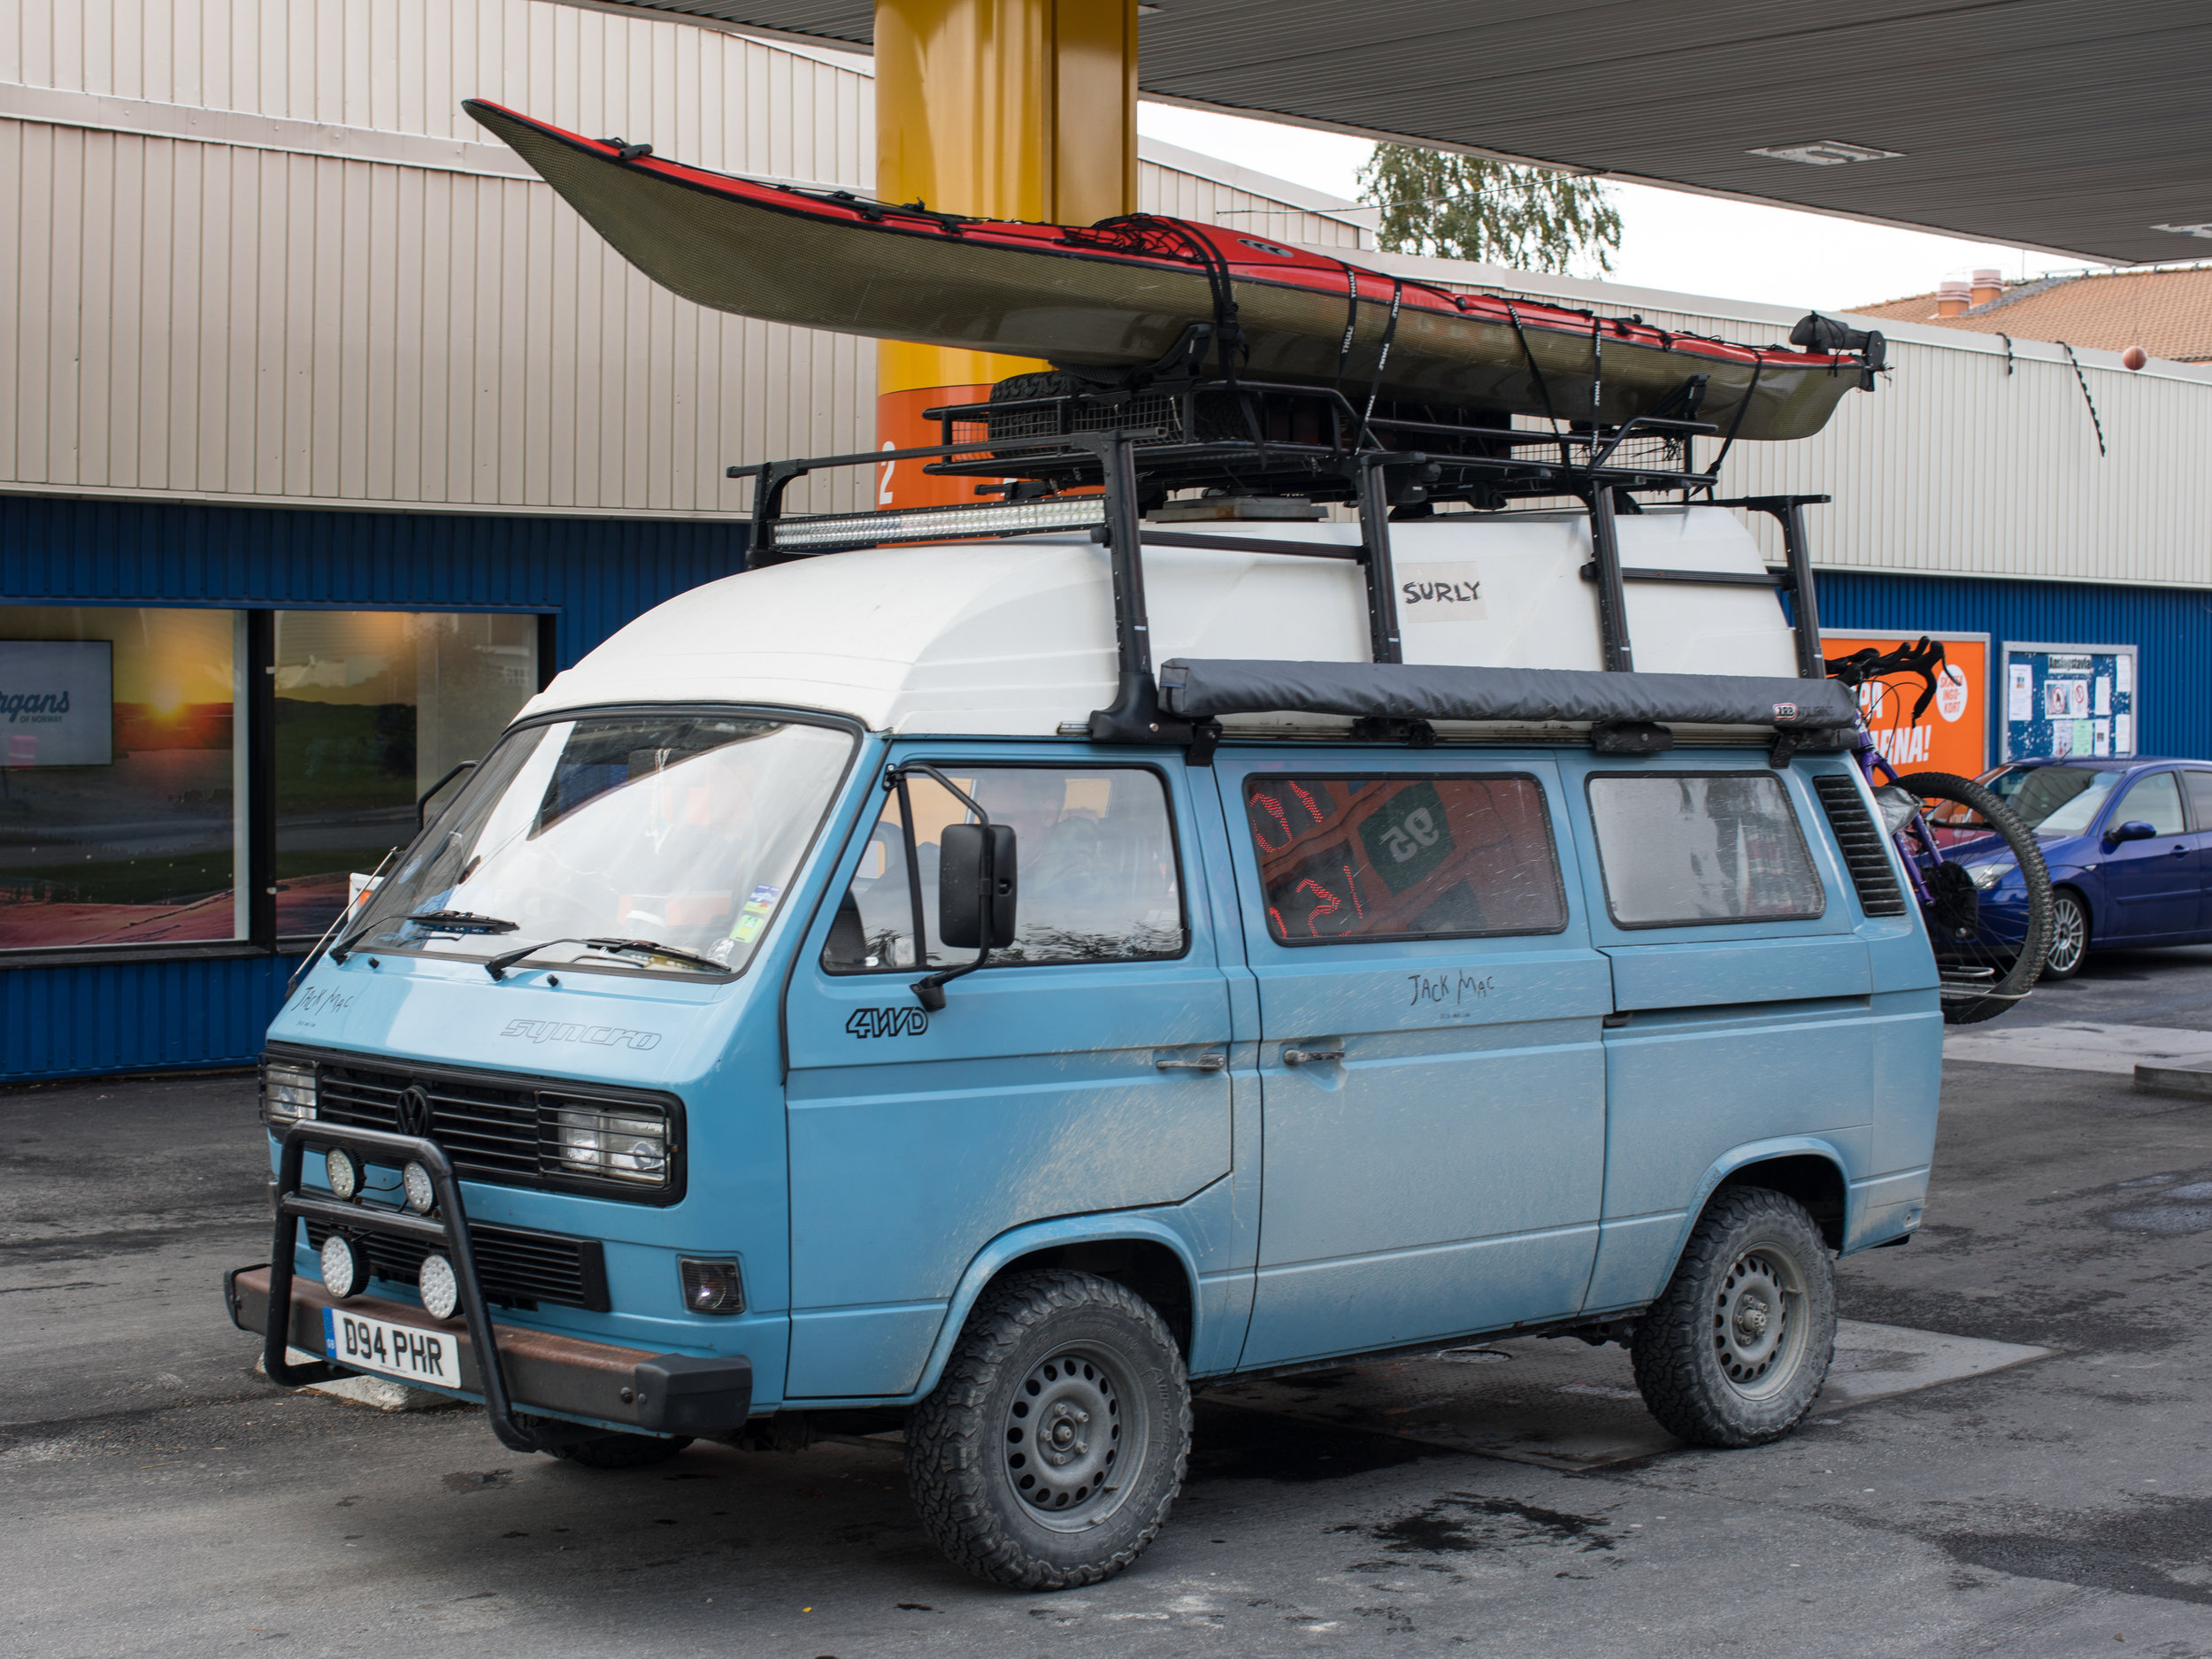 vw, vw syncro, vw bus, syncro, t3 syncro, lt 4x4, travel, jack mac, bicycle touring apocalypse, prijon, prijon kayaks, surly, surly bikes, bikepacking, vw t25, t25, t3, vanagon, vanagon syncro, norway, lofoten, vanlife, vanlife vlog, vanlifer,